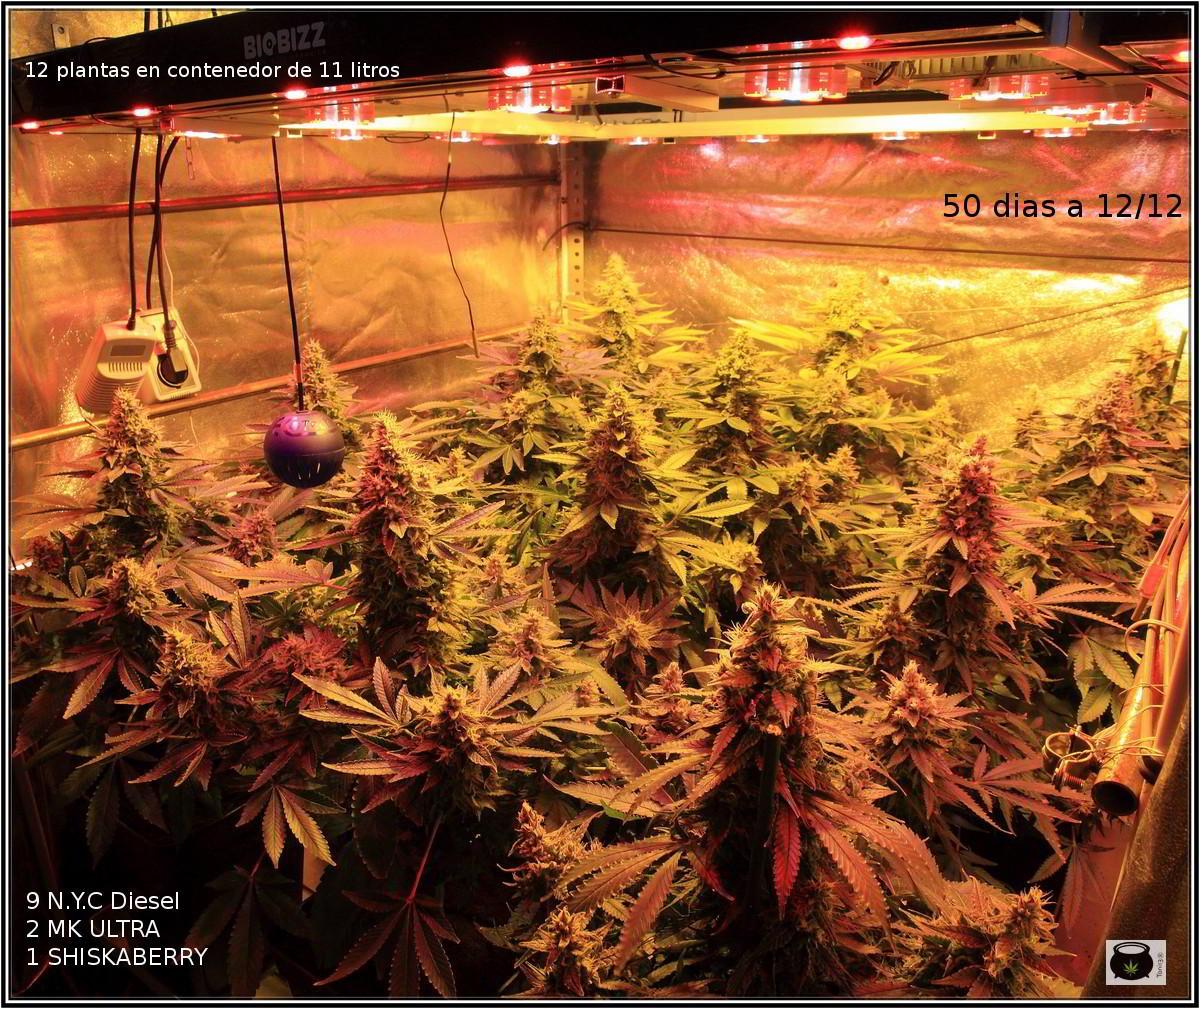 Cultivo de marihuana LED no aporta calor a las plantas